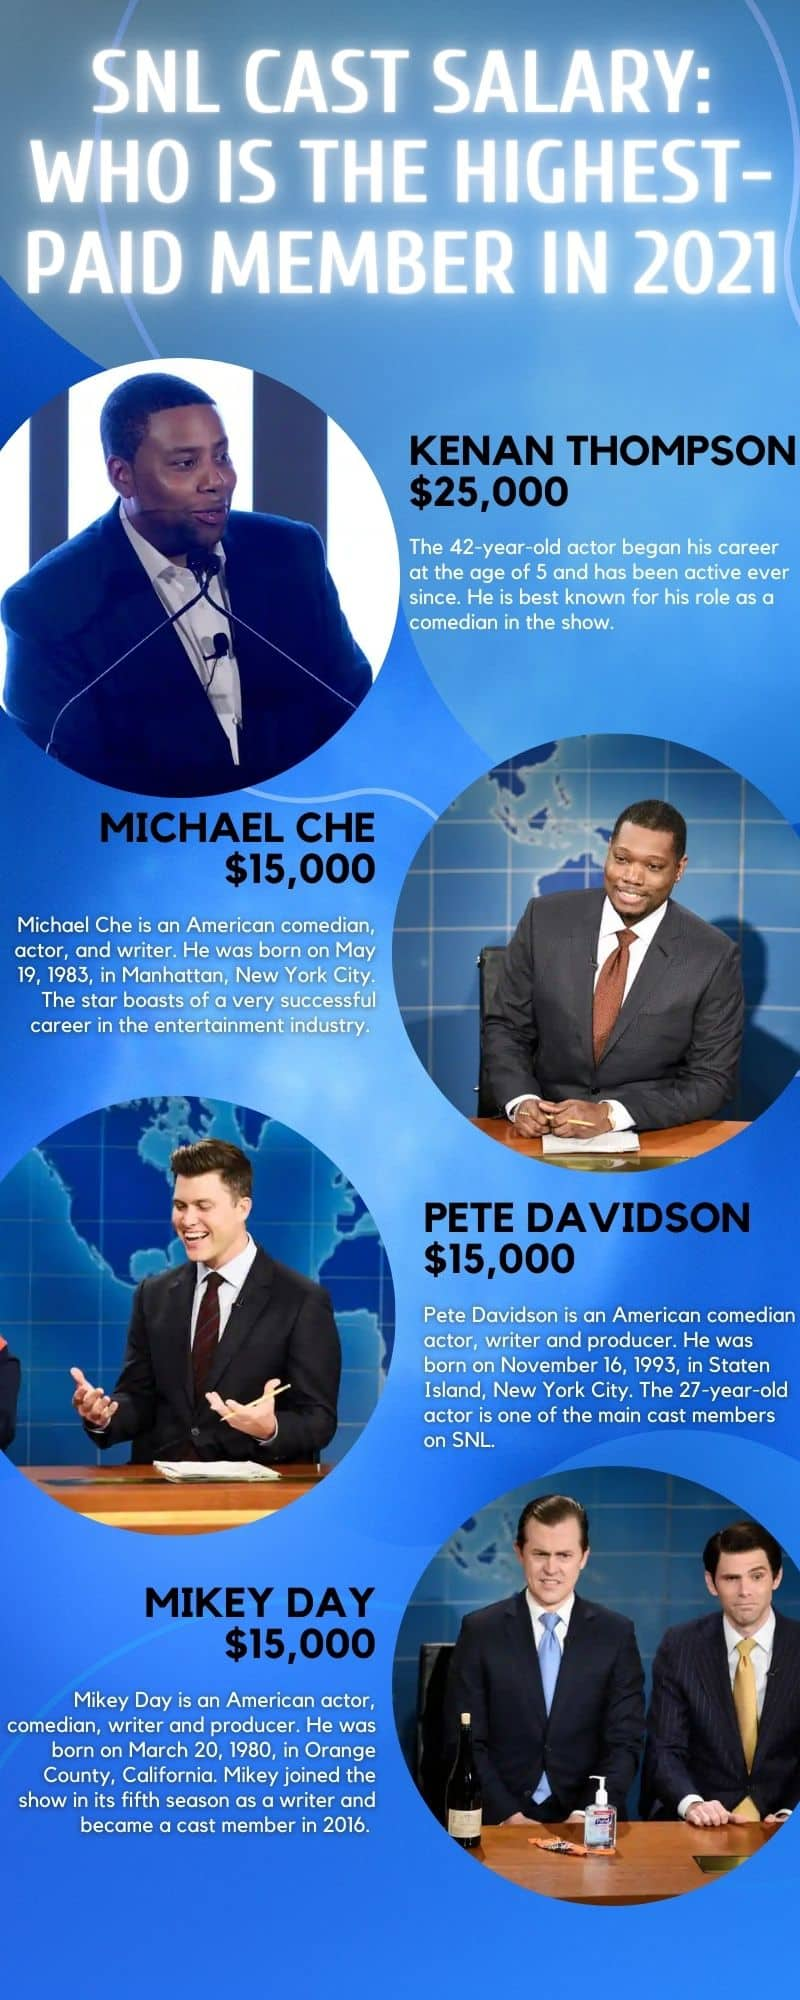 SNL cast salary